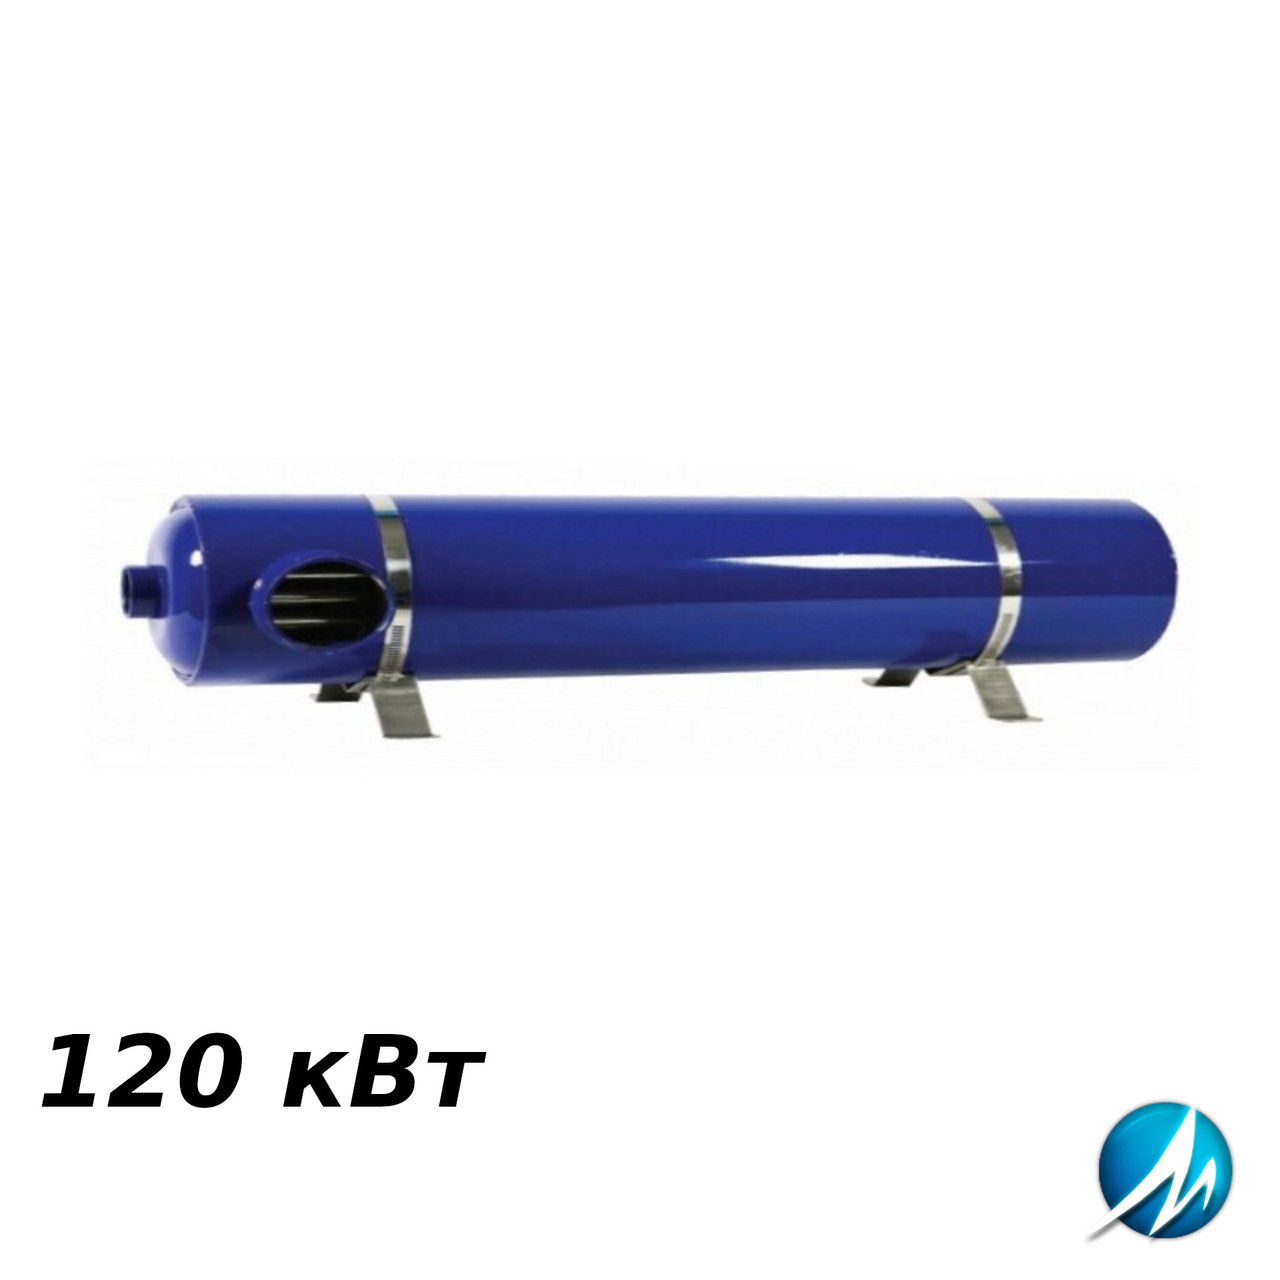 Теплообмінник Emaux HE 120 кВт